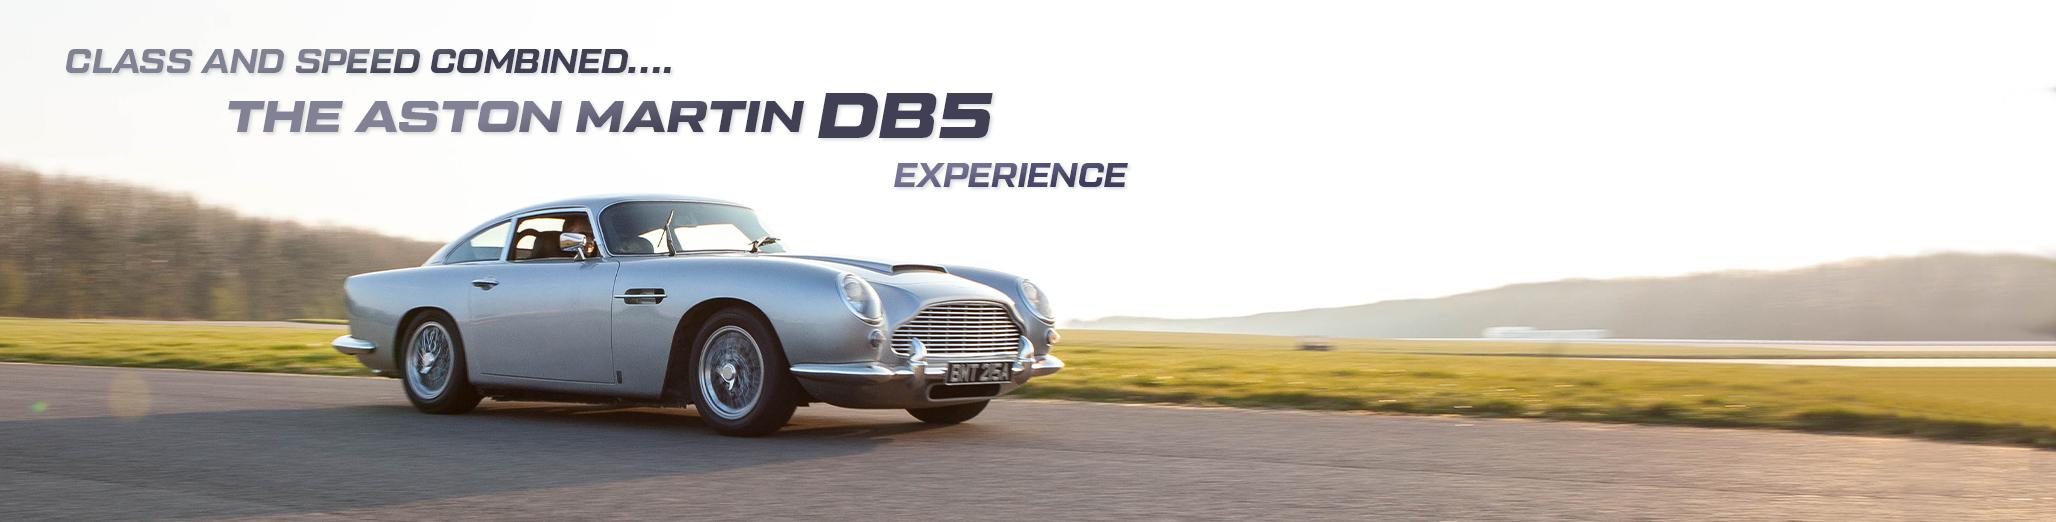 Bond DB5 Experience